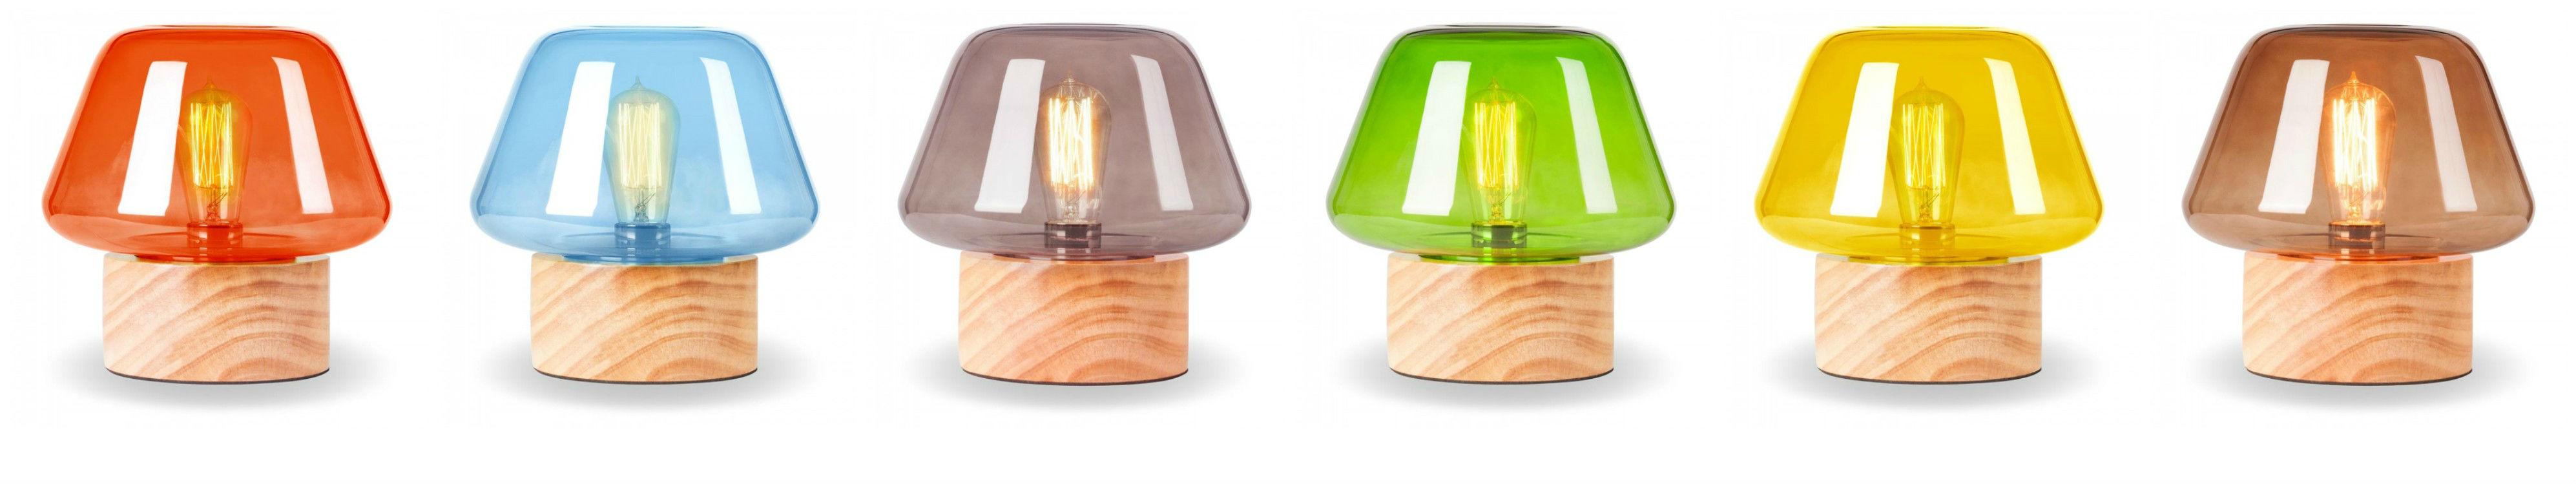 Lampes-design-champignon-Cult-Living-Trapeze